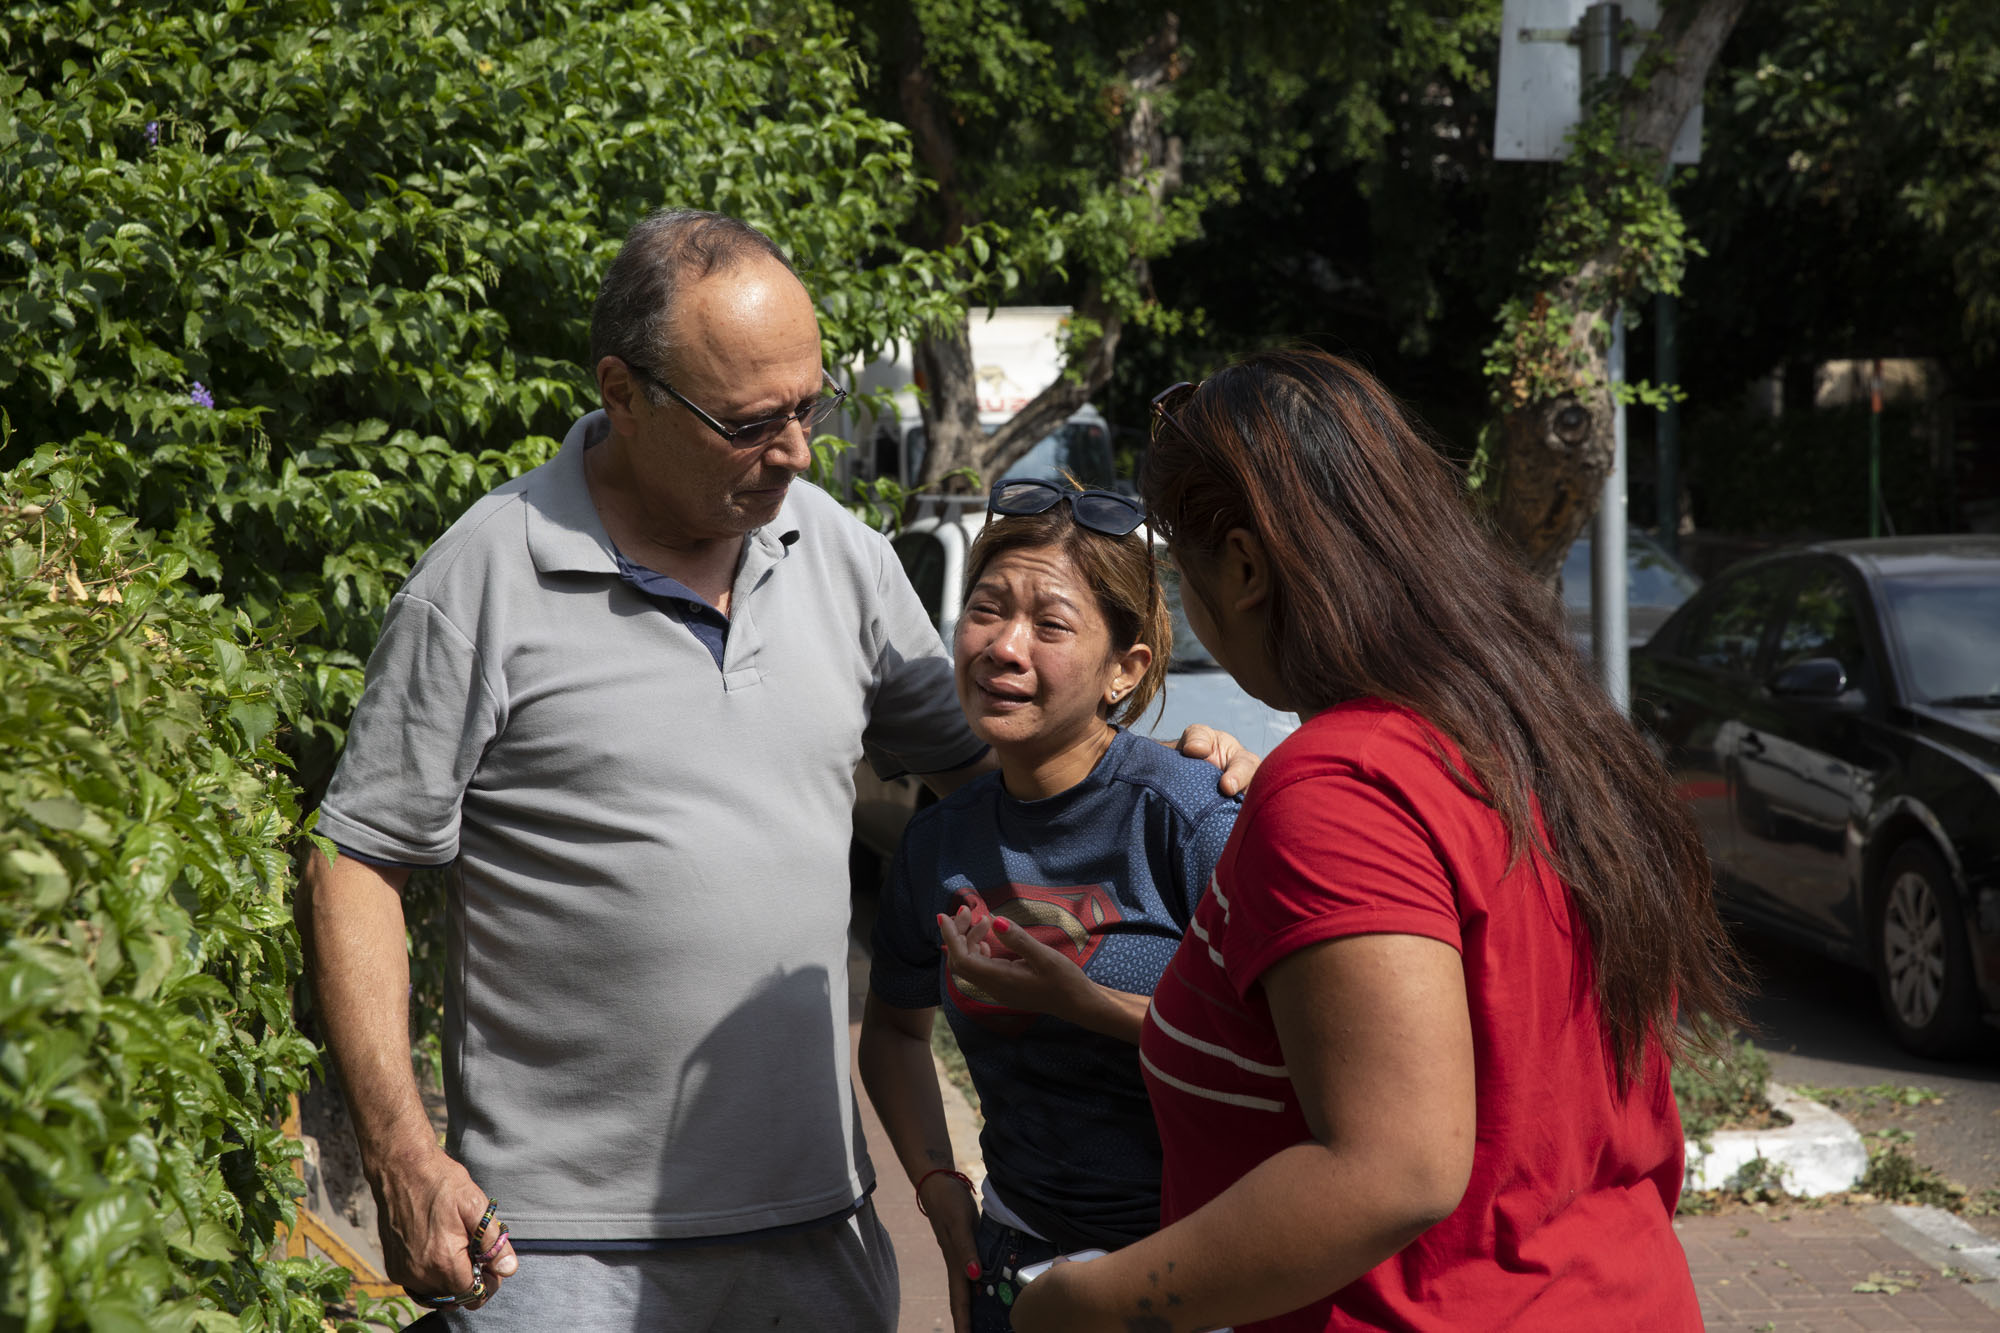 A friend of Geraldine Esta is seen afterEsta and her daughters were taken into custody, July 23, 2019. (Oren Ziv/Activestills.org)